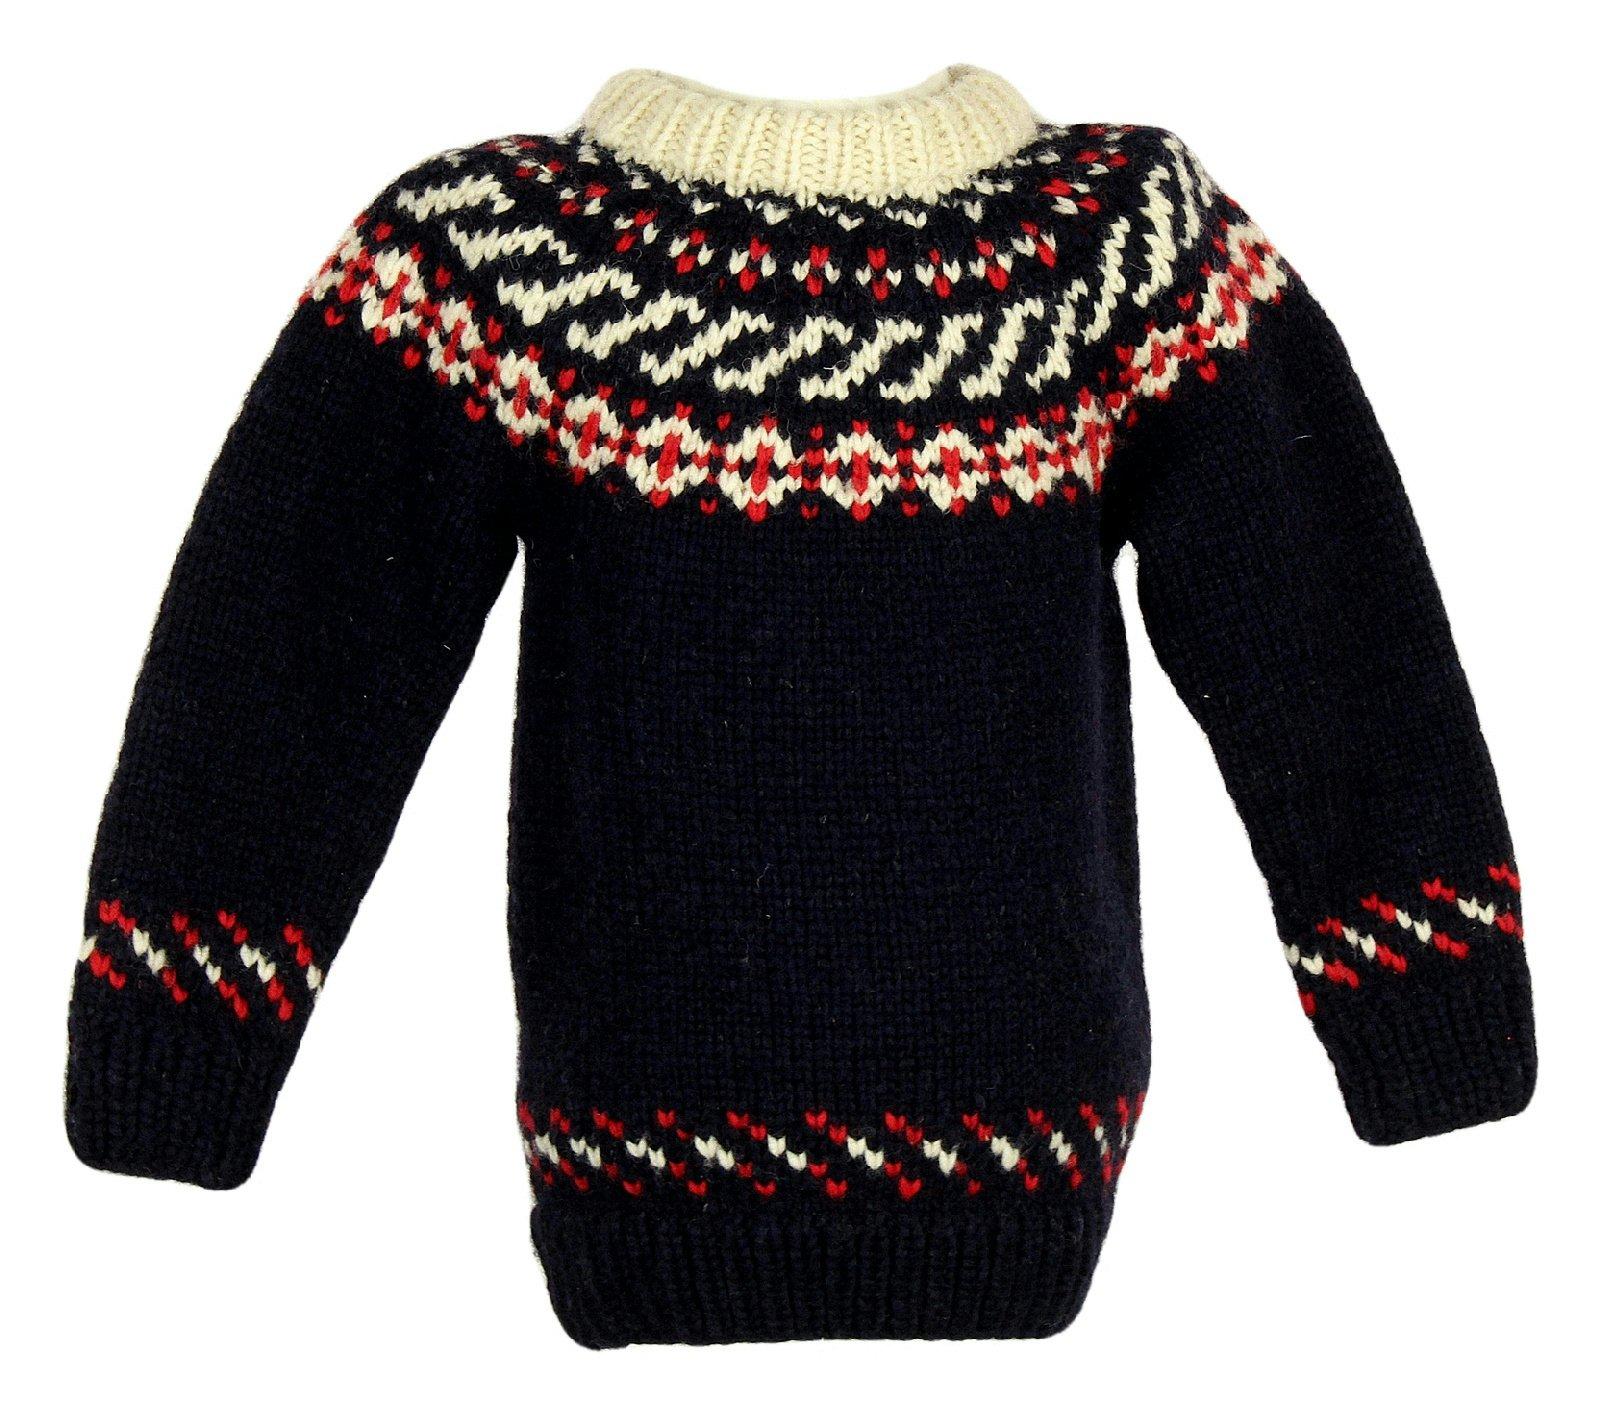 Crewcuts Kids Canadian Sweater Company Hand Knit Wool Sweater Sz M B5259